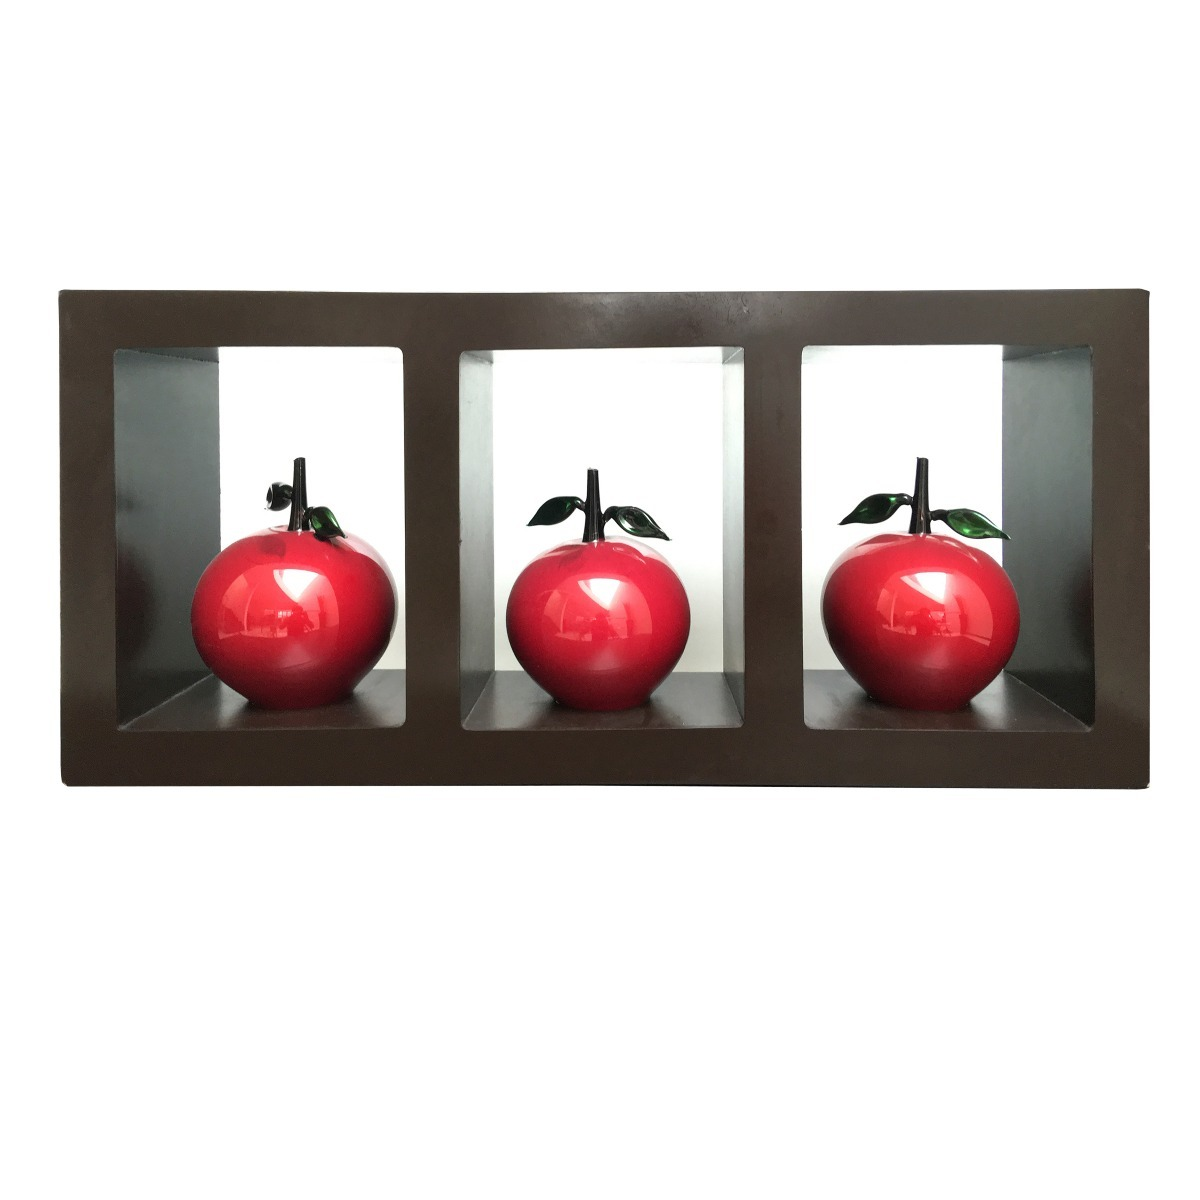 Adorno base de madera para pared con 3 esferas - Adornos de pared de forja ...